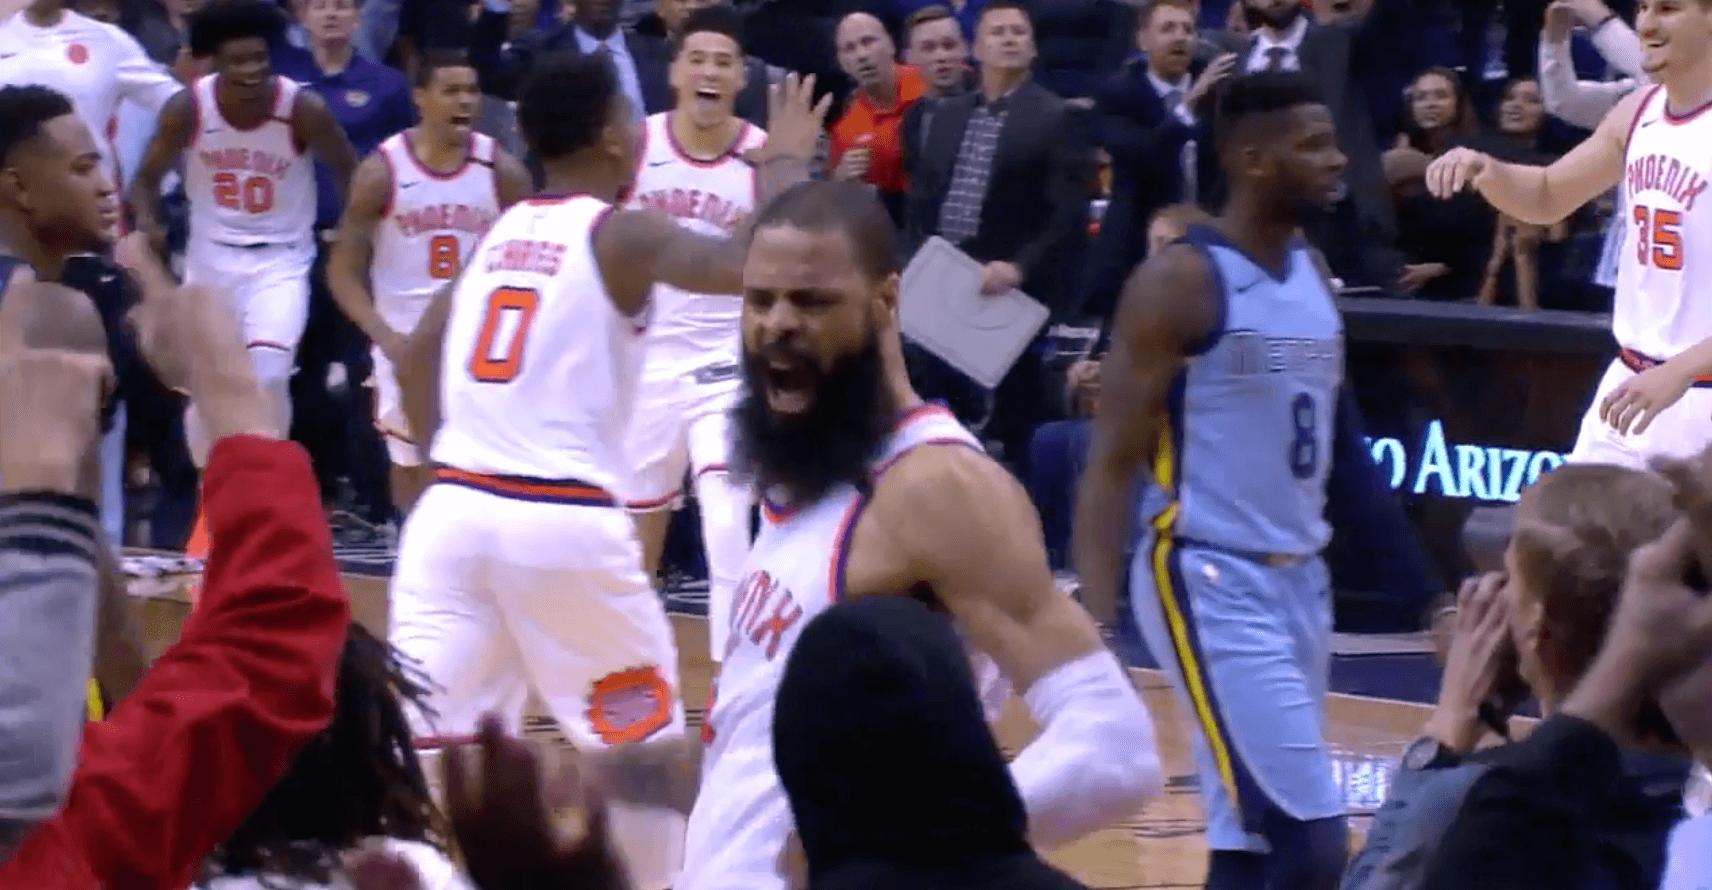 Tyson Chandler Suns alley-oop buzzer